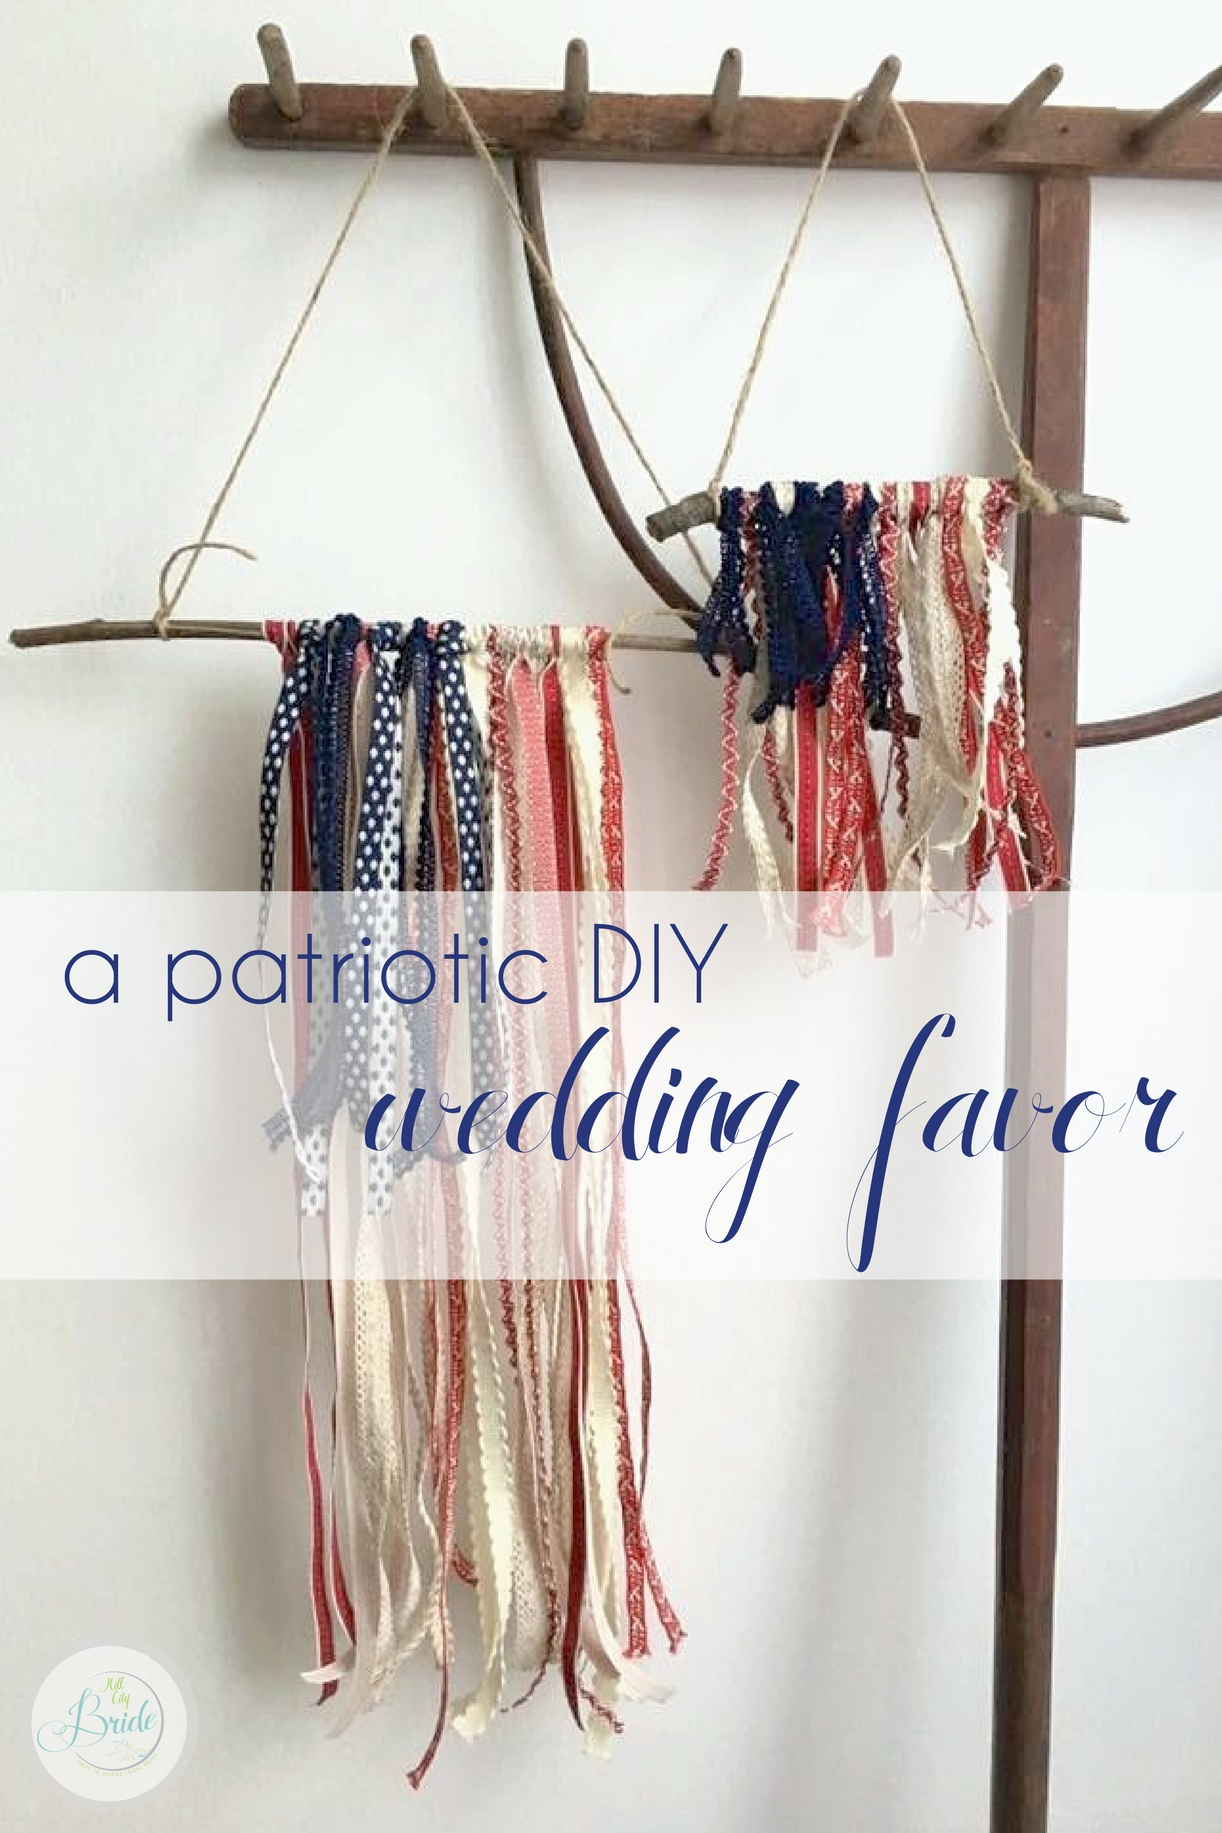 Patriotic DIY Wedding Favor as seen on Hill City Bride Virginia Wedding Blog and Magazine - 4th of July, military, flag, ribbon flag, americana